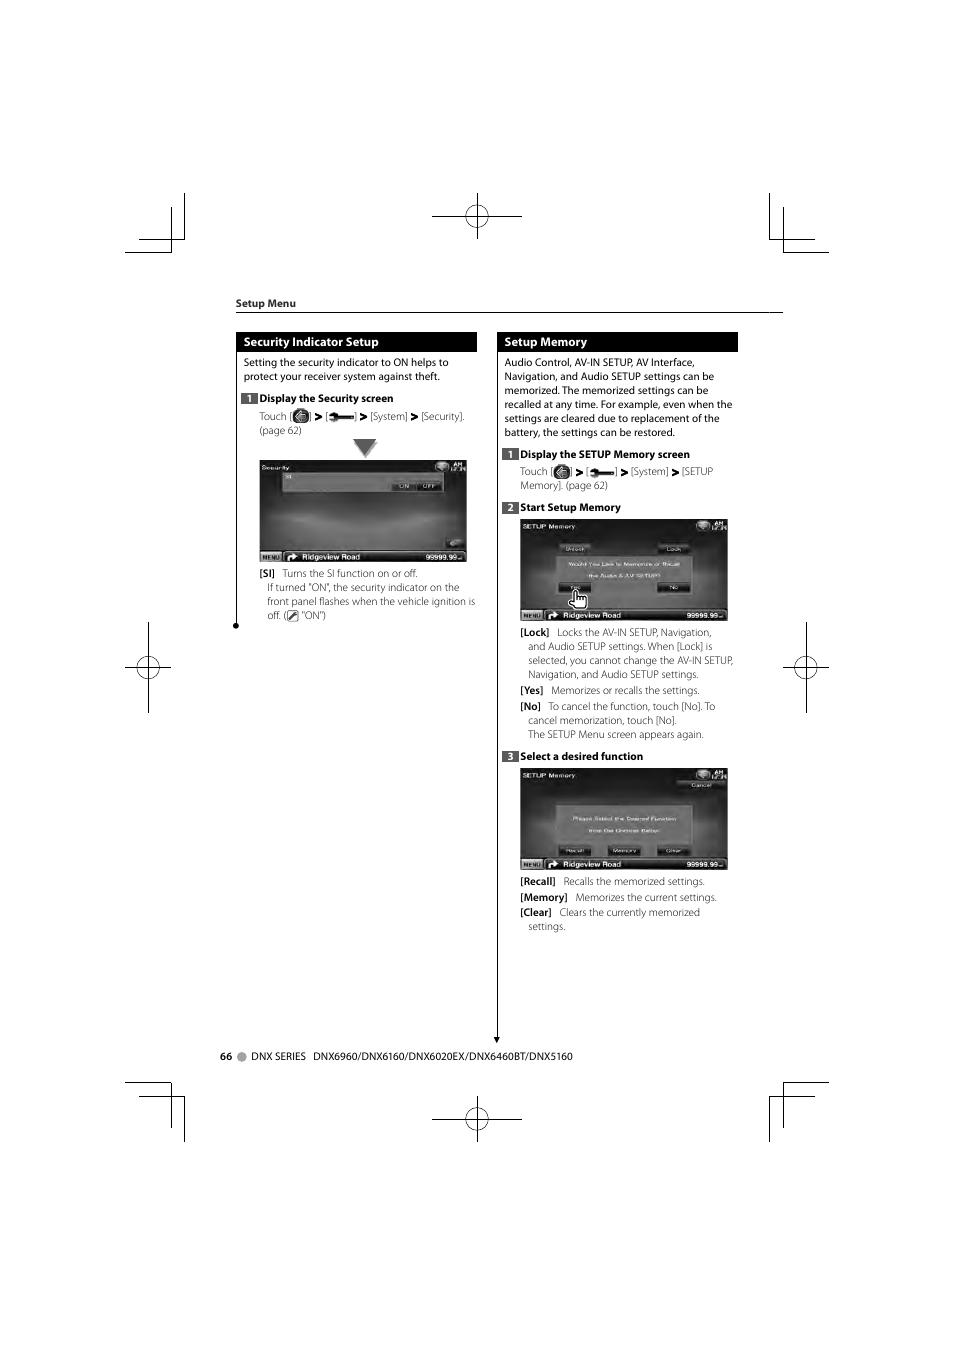 kenwood dnx 6160 manual daily instruction manual guides u2022 rh testingwordpress co Kenwood DNX 6160 Review Kenwood DNX6160 Back